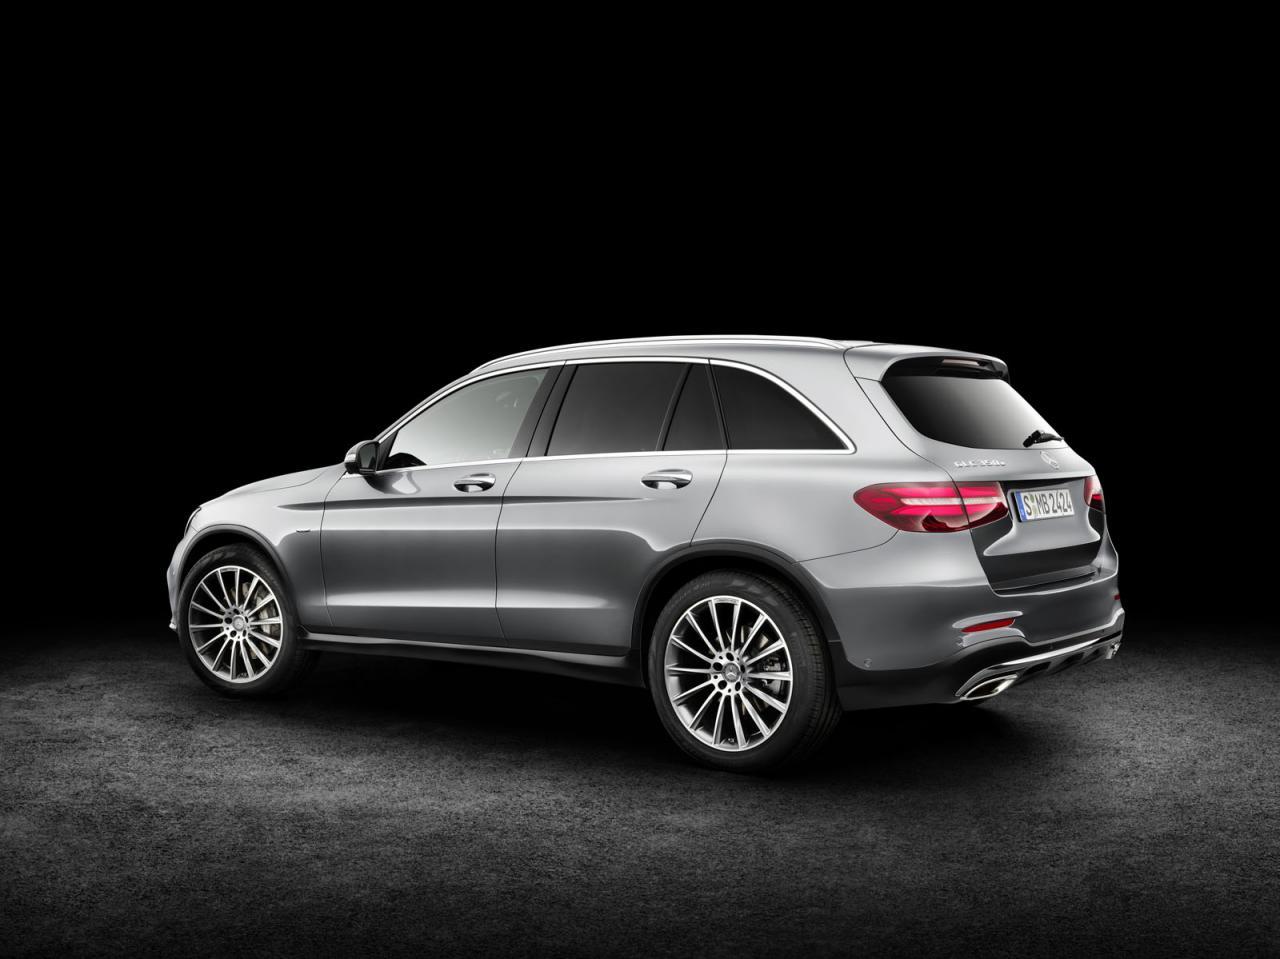 Mercedes-Benz GLC 2016 official photo / официальное фото